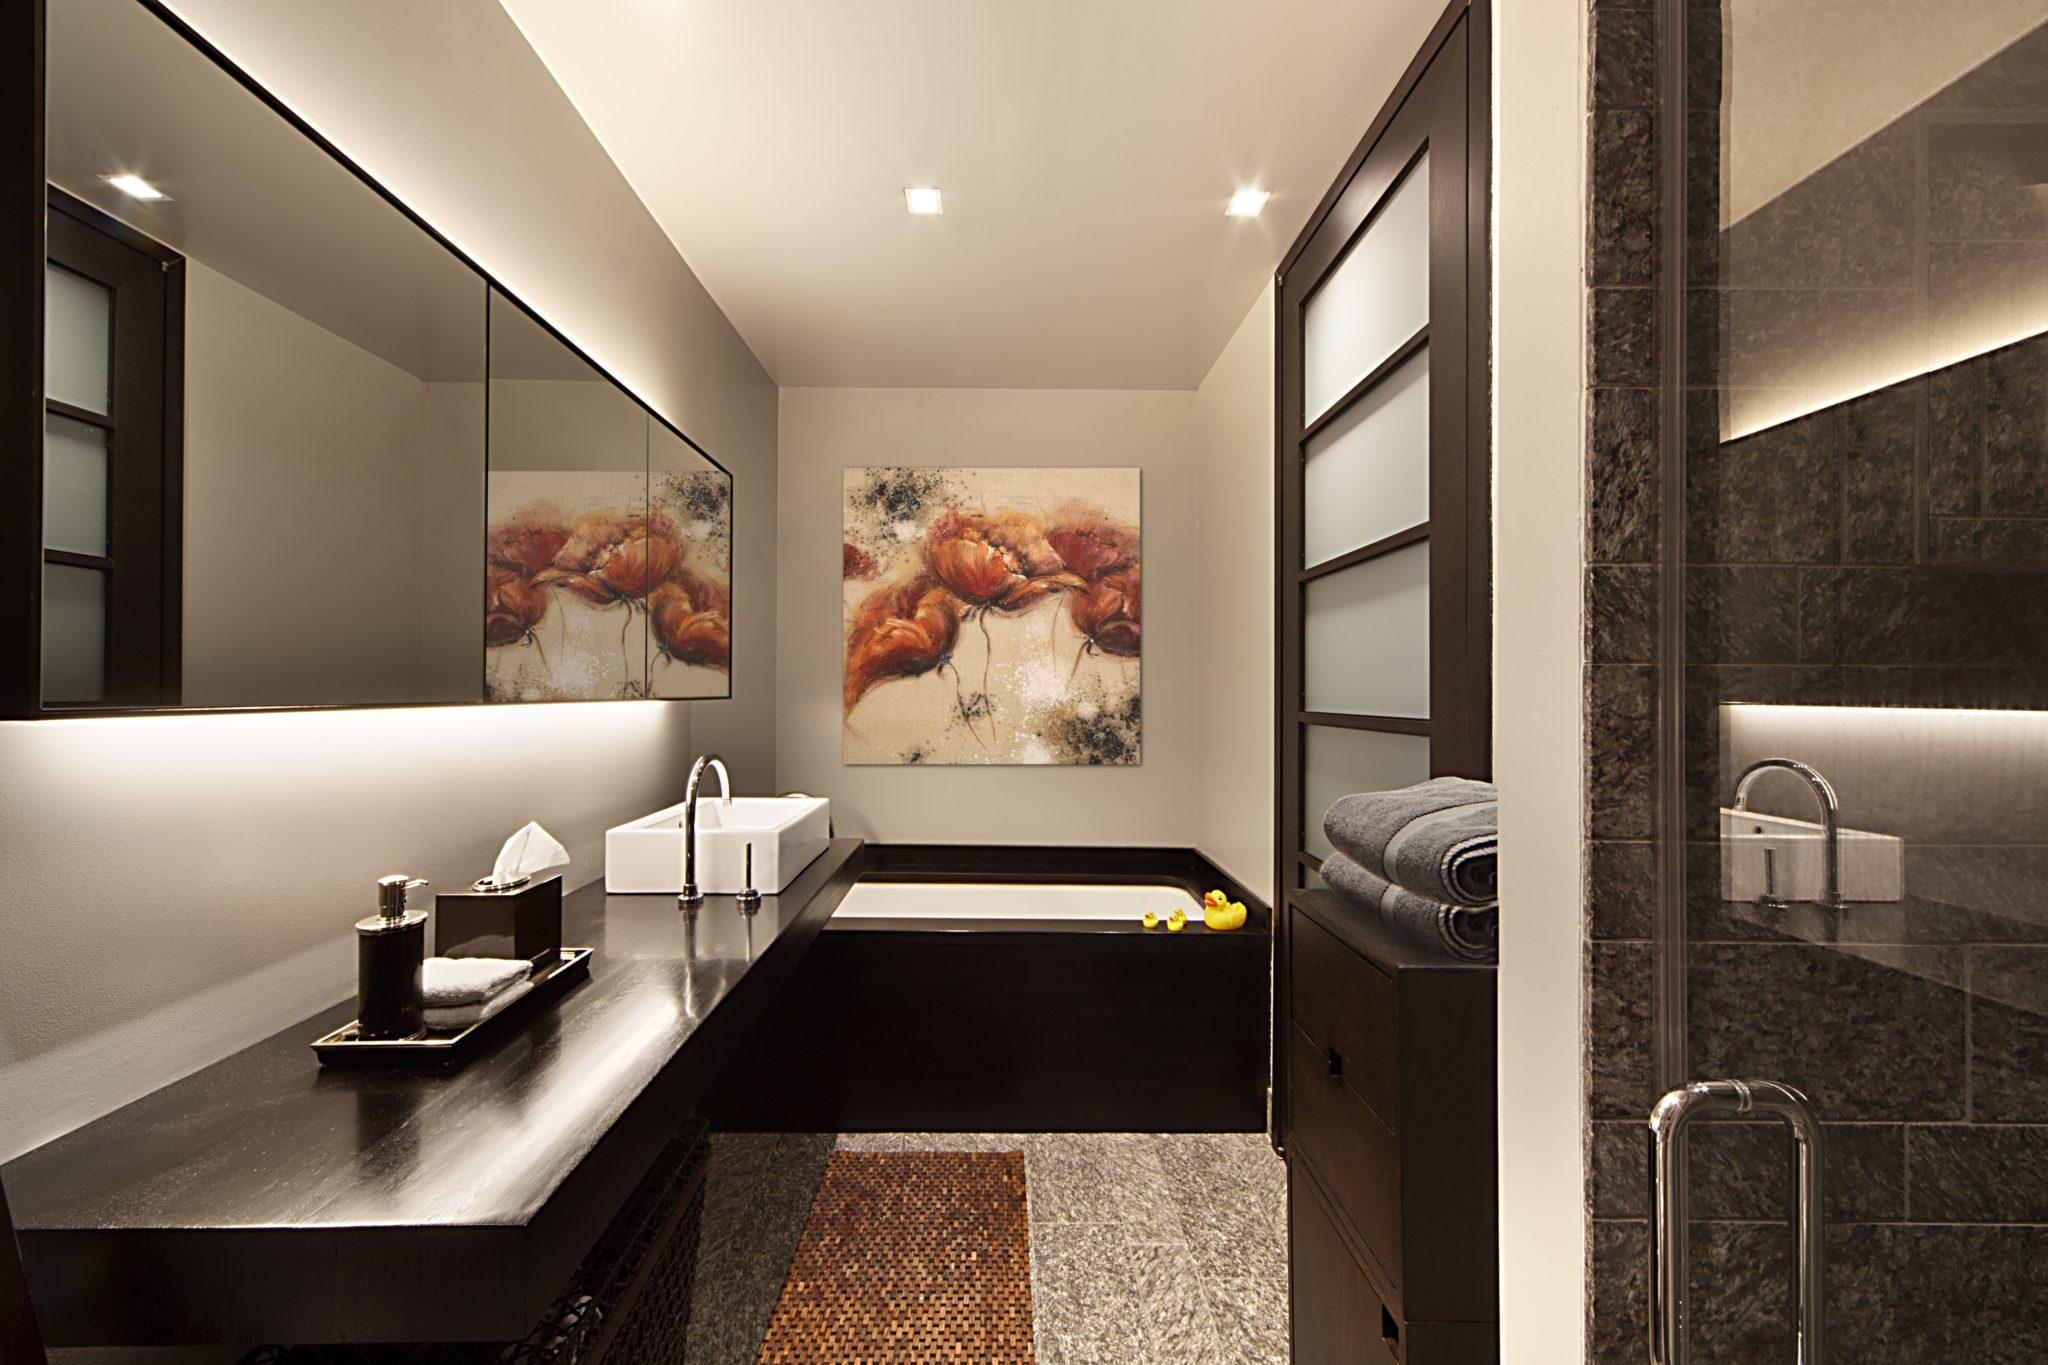 Brown bathrooms